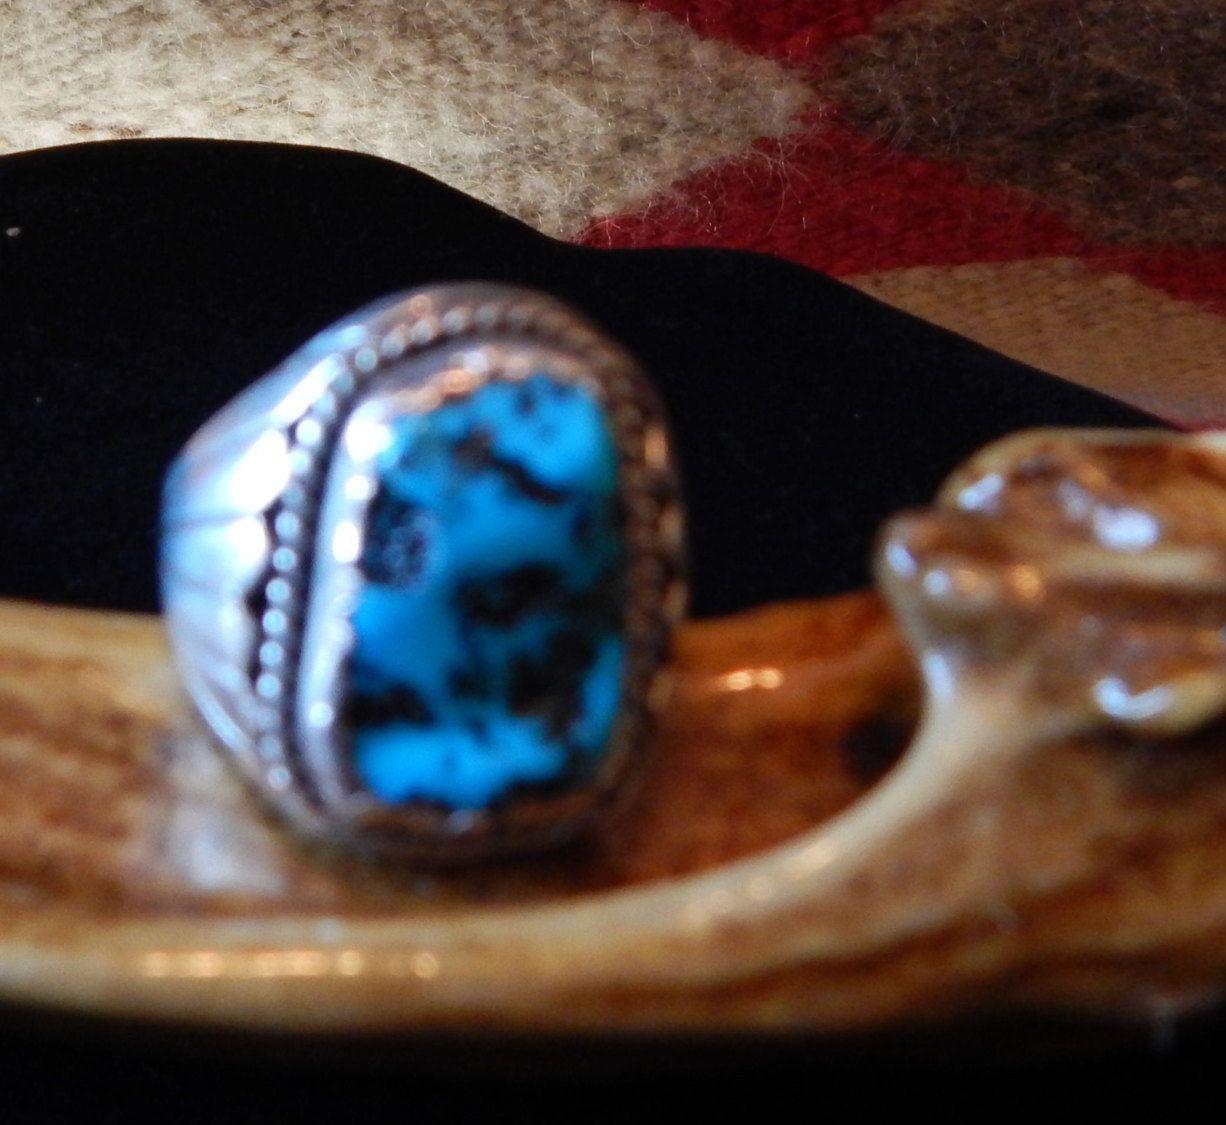 Kingman turquoise 10 half ring Native American Jewelry Navajo turquoise jewelry vintage turquoise mens jewelry horse womens jewelry by CherokeeKachinaCasey on Etsy